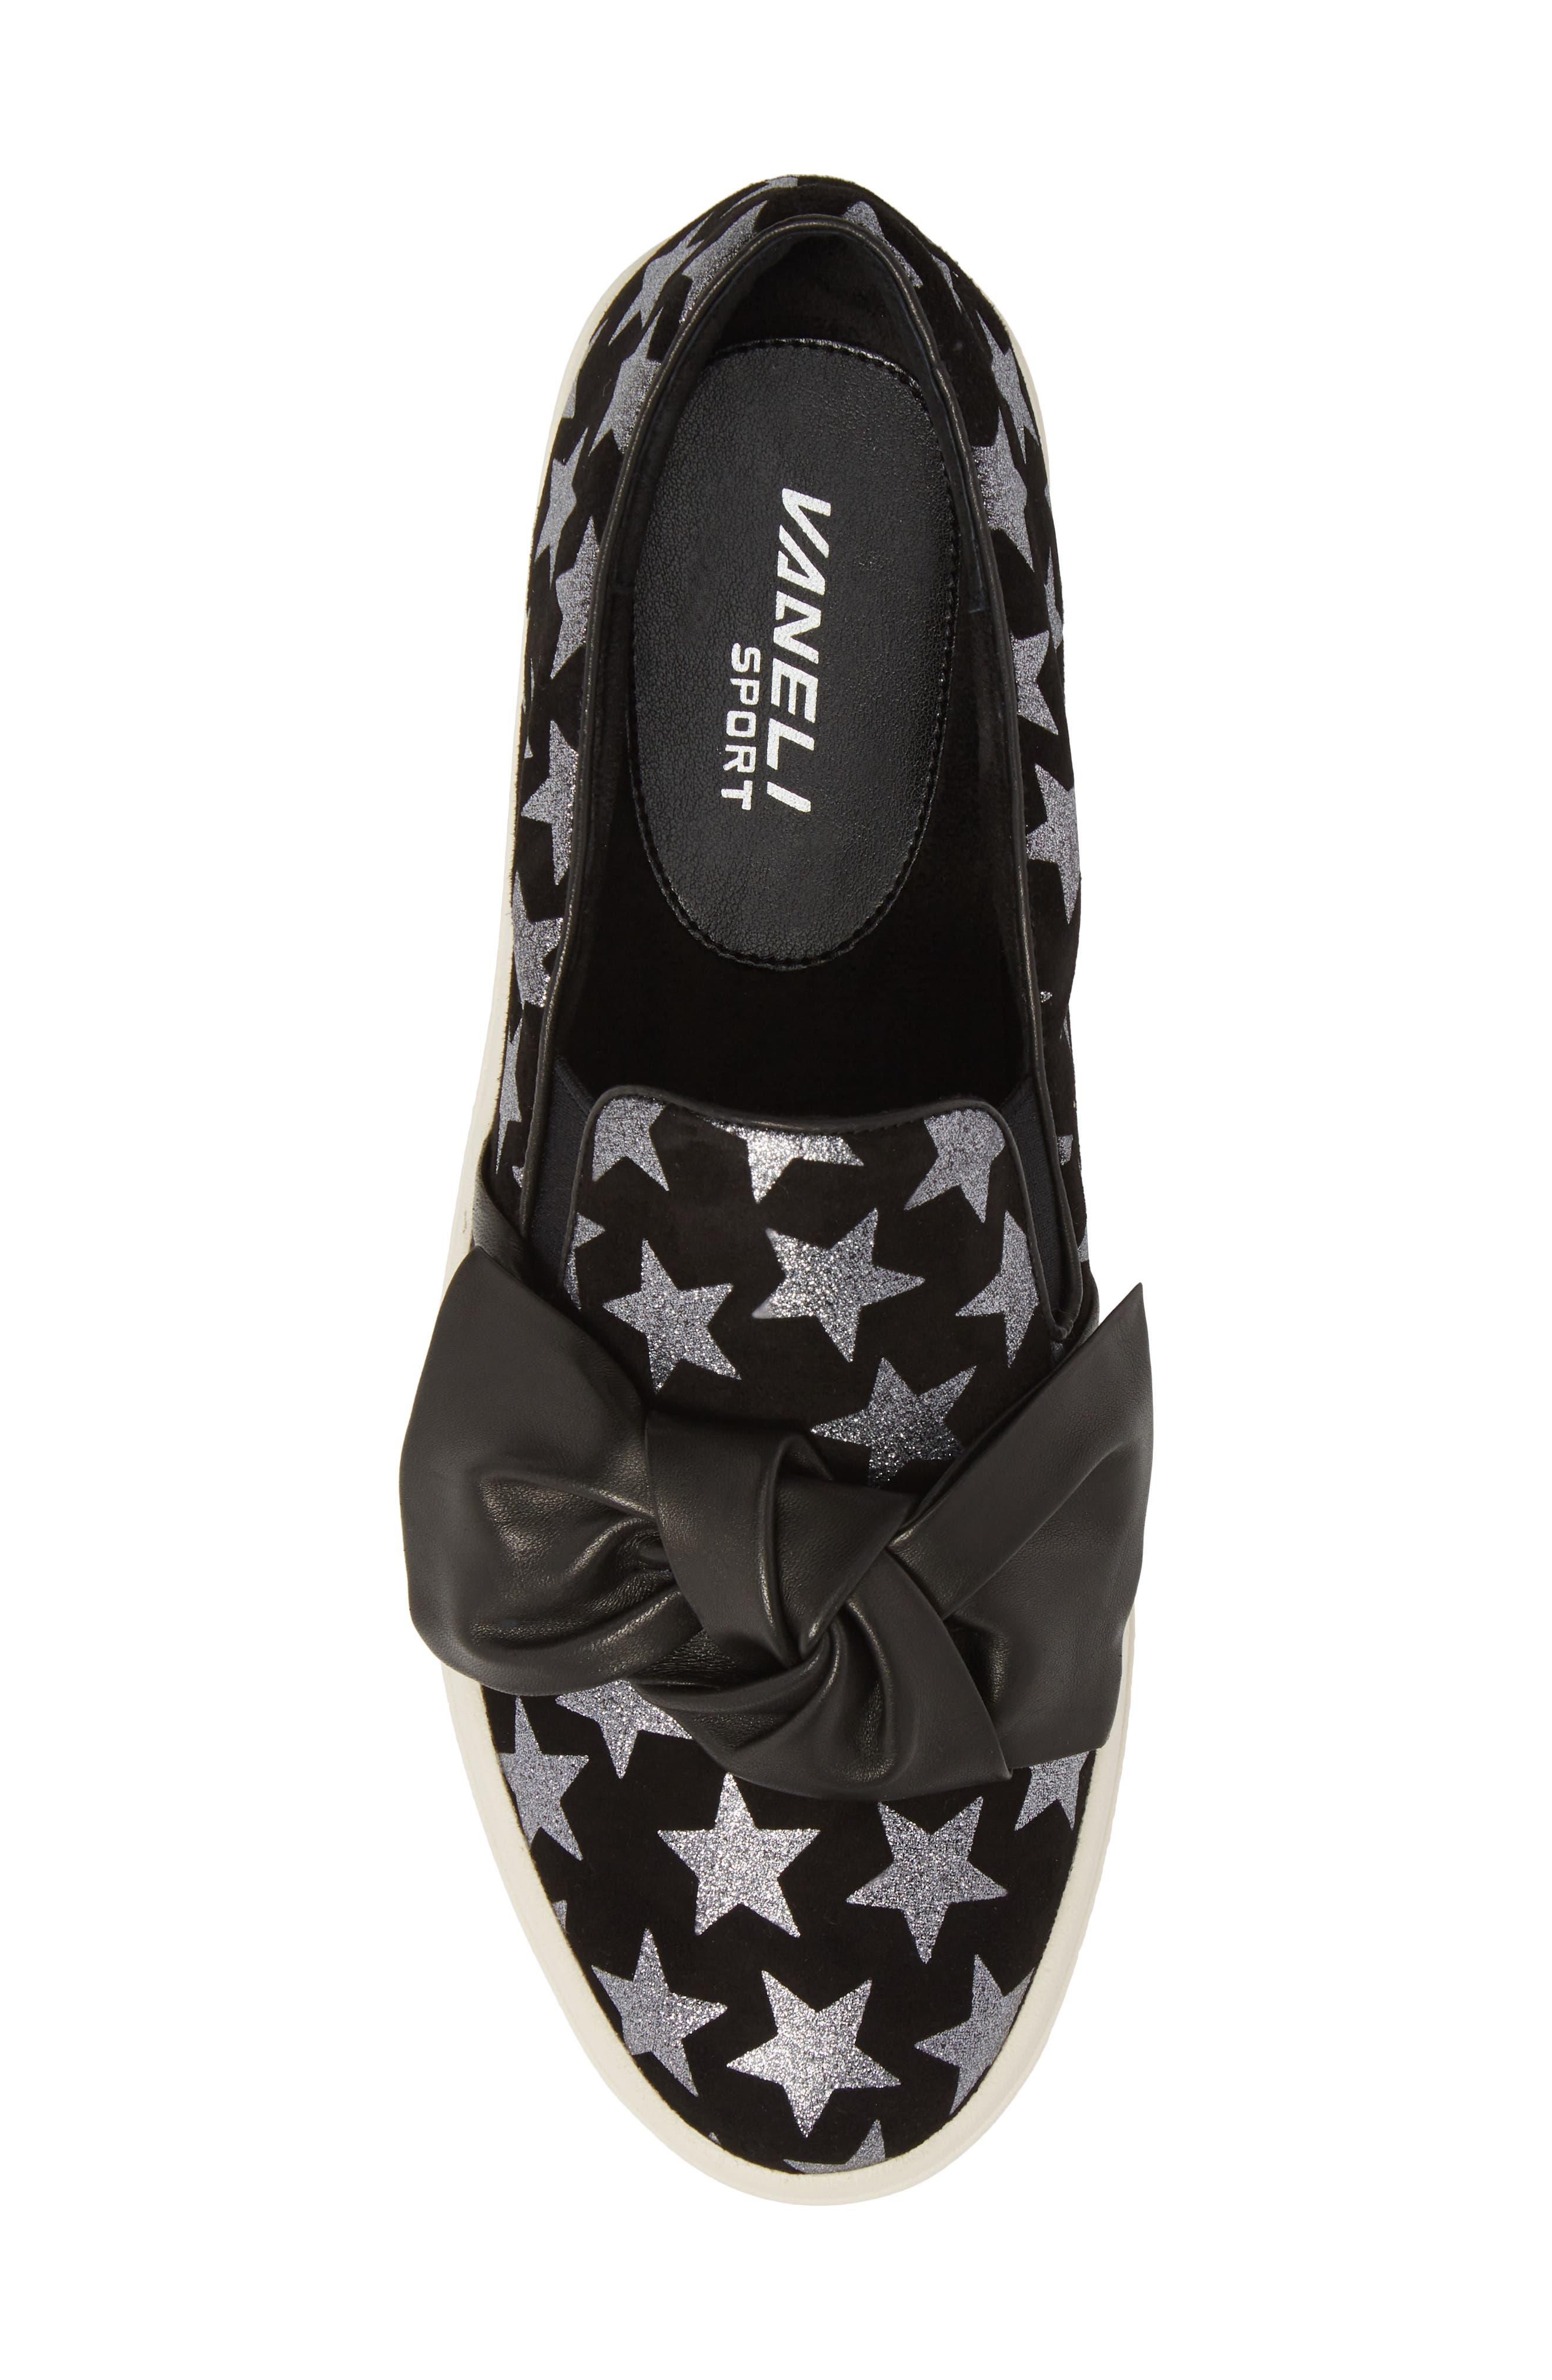 Odelet Slip-On Sneaker,                             Alternate thumbnail 5, color,                             BLACK/ PEWTER SUEDE